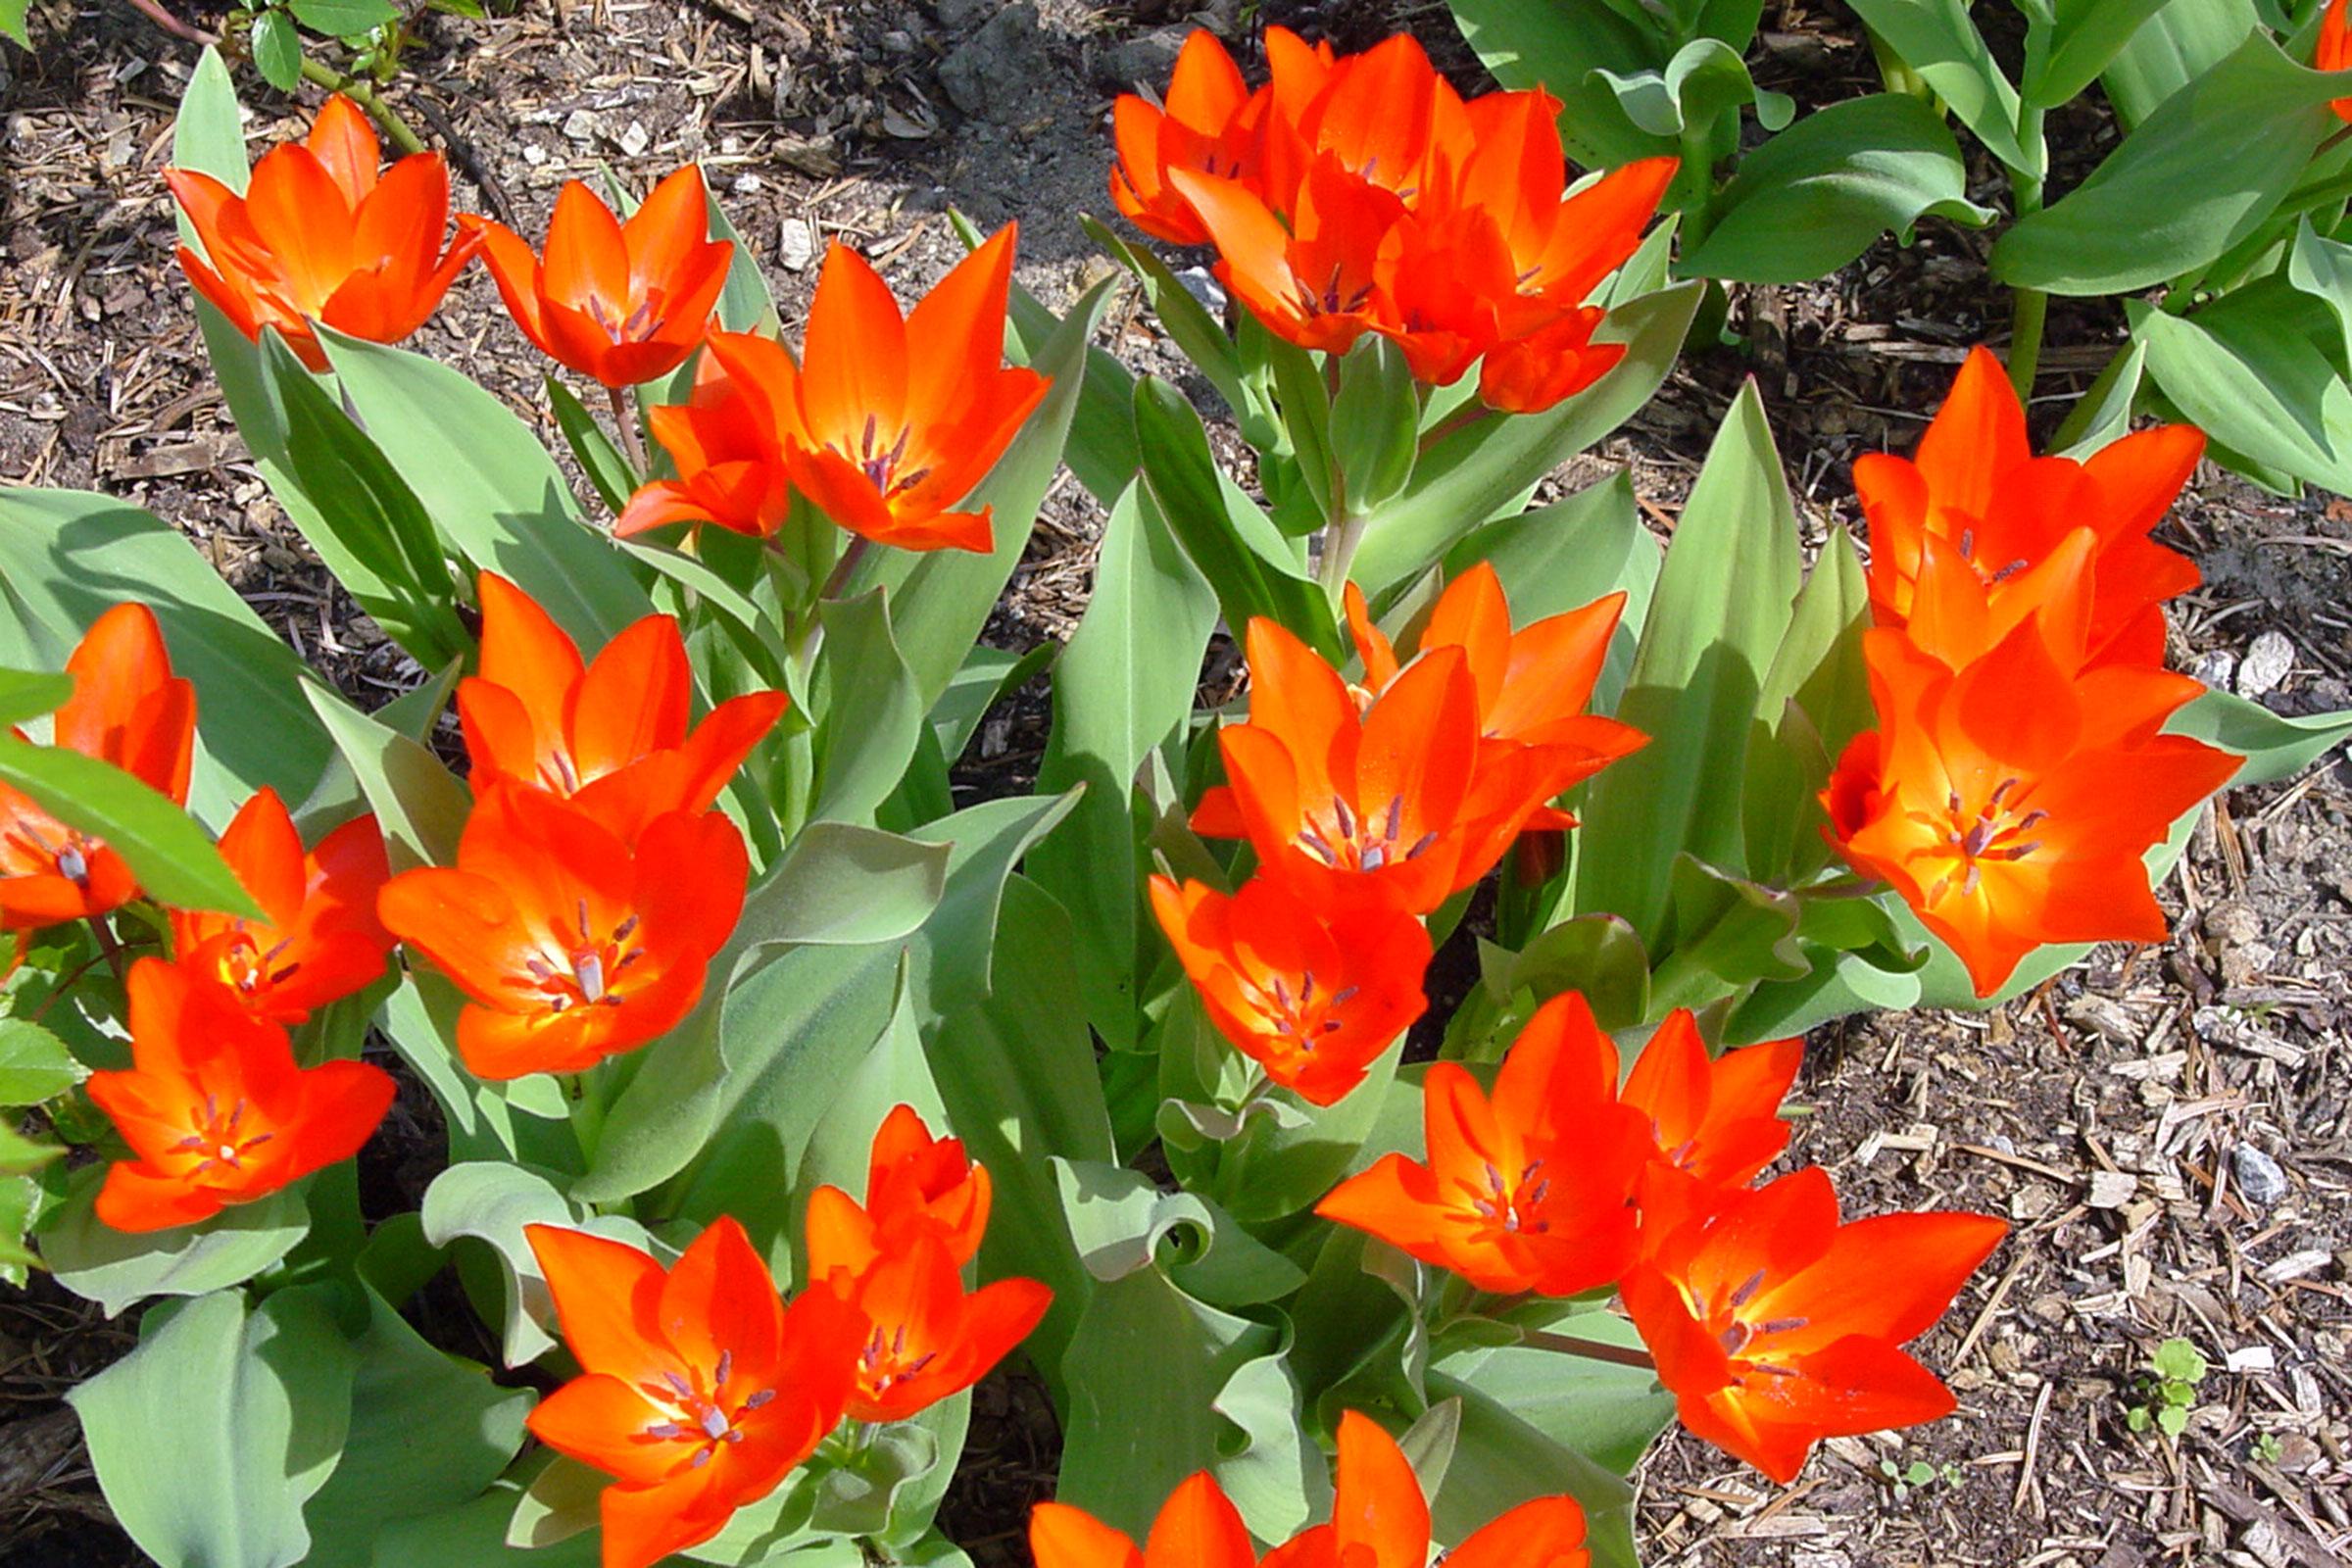 Wildtulpe im Frühling